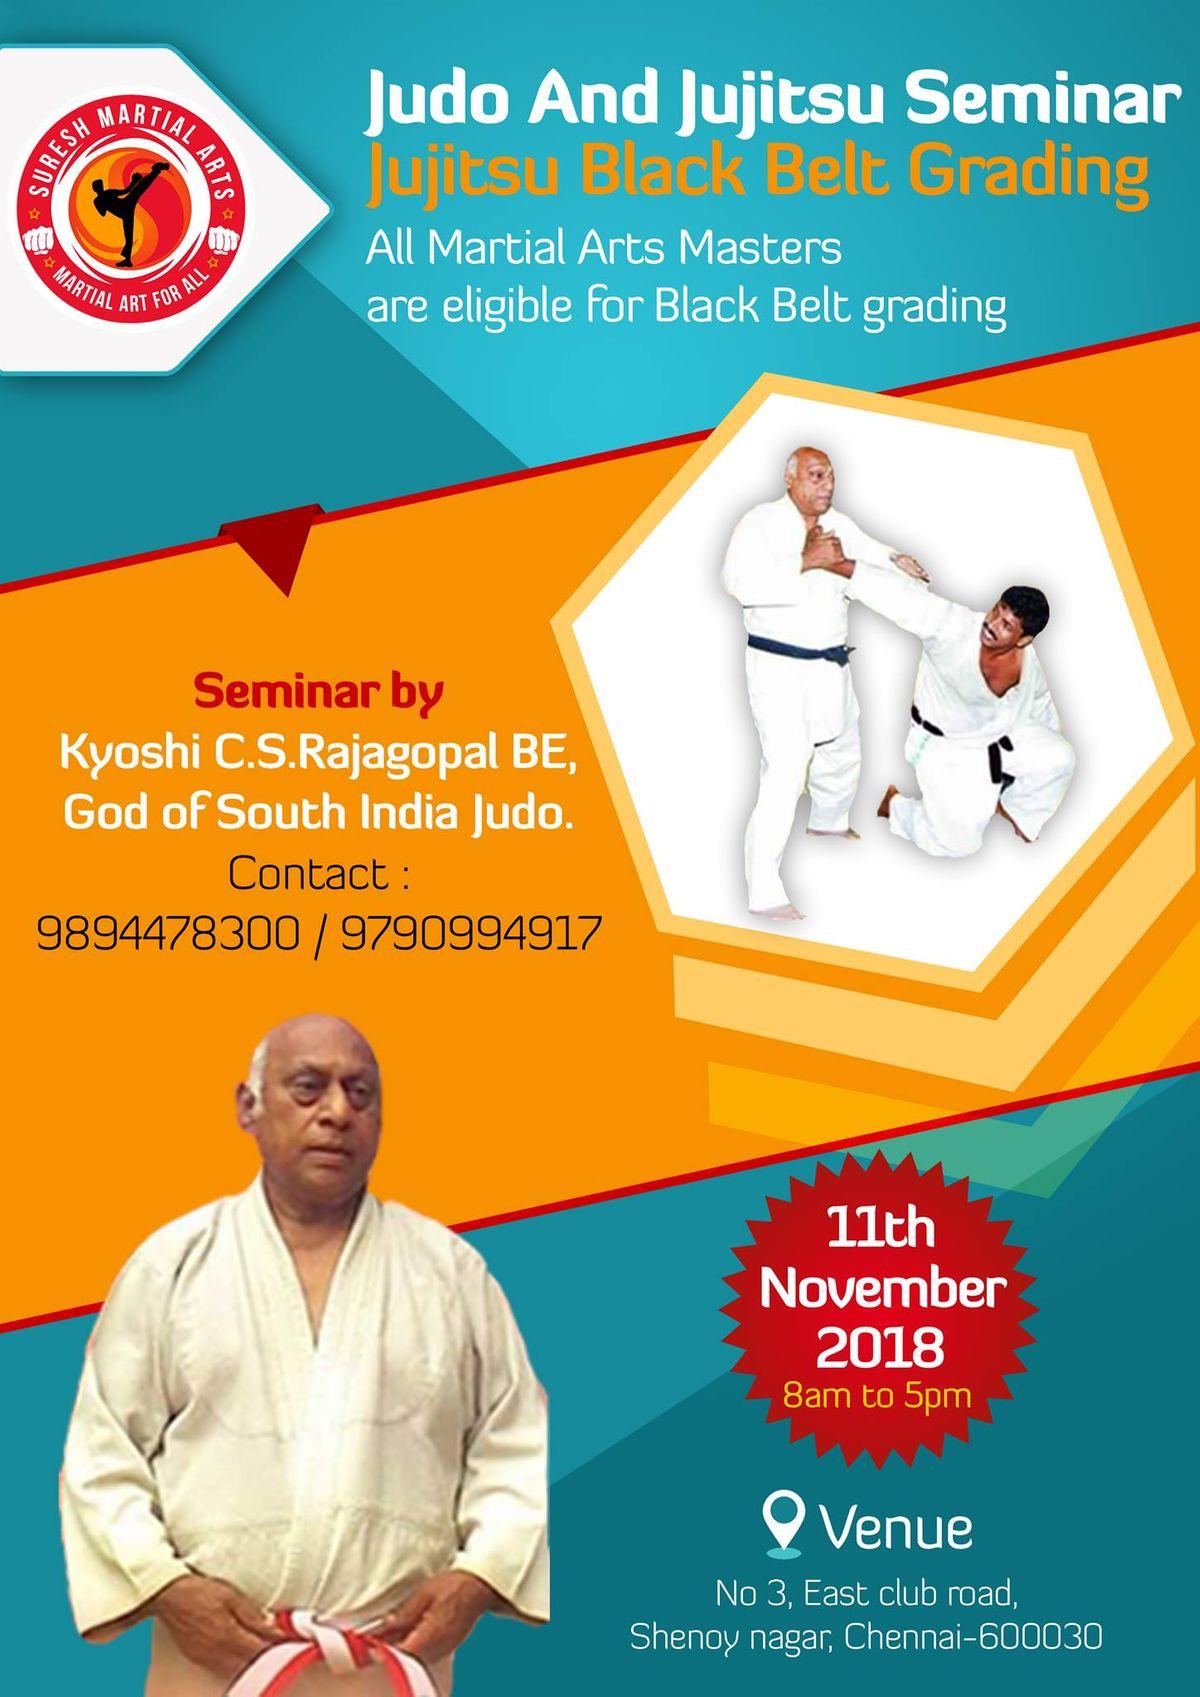 Judo and Jujitsu Seminar & Jujitsu Black Belt Grading